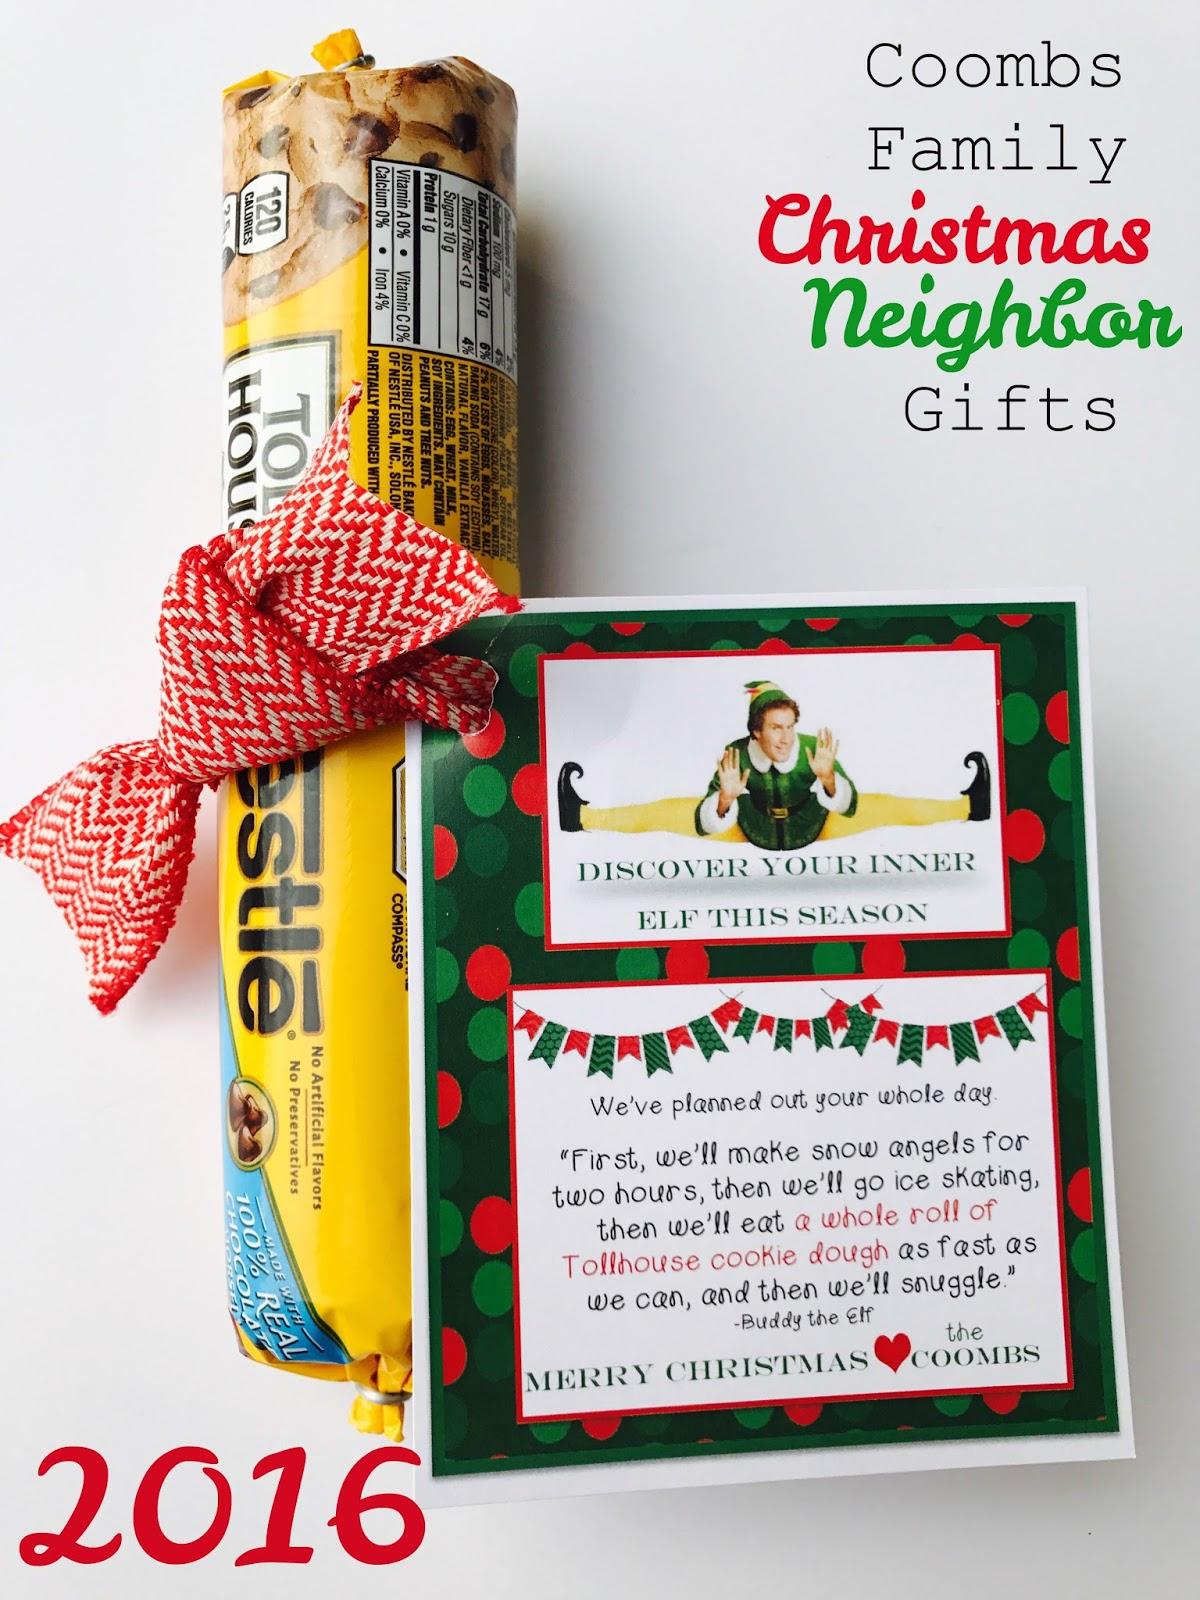 coombs family christmas neighbor gifts 2016